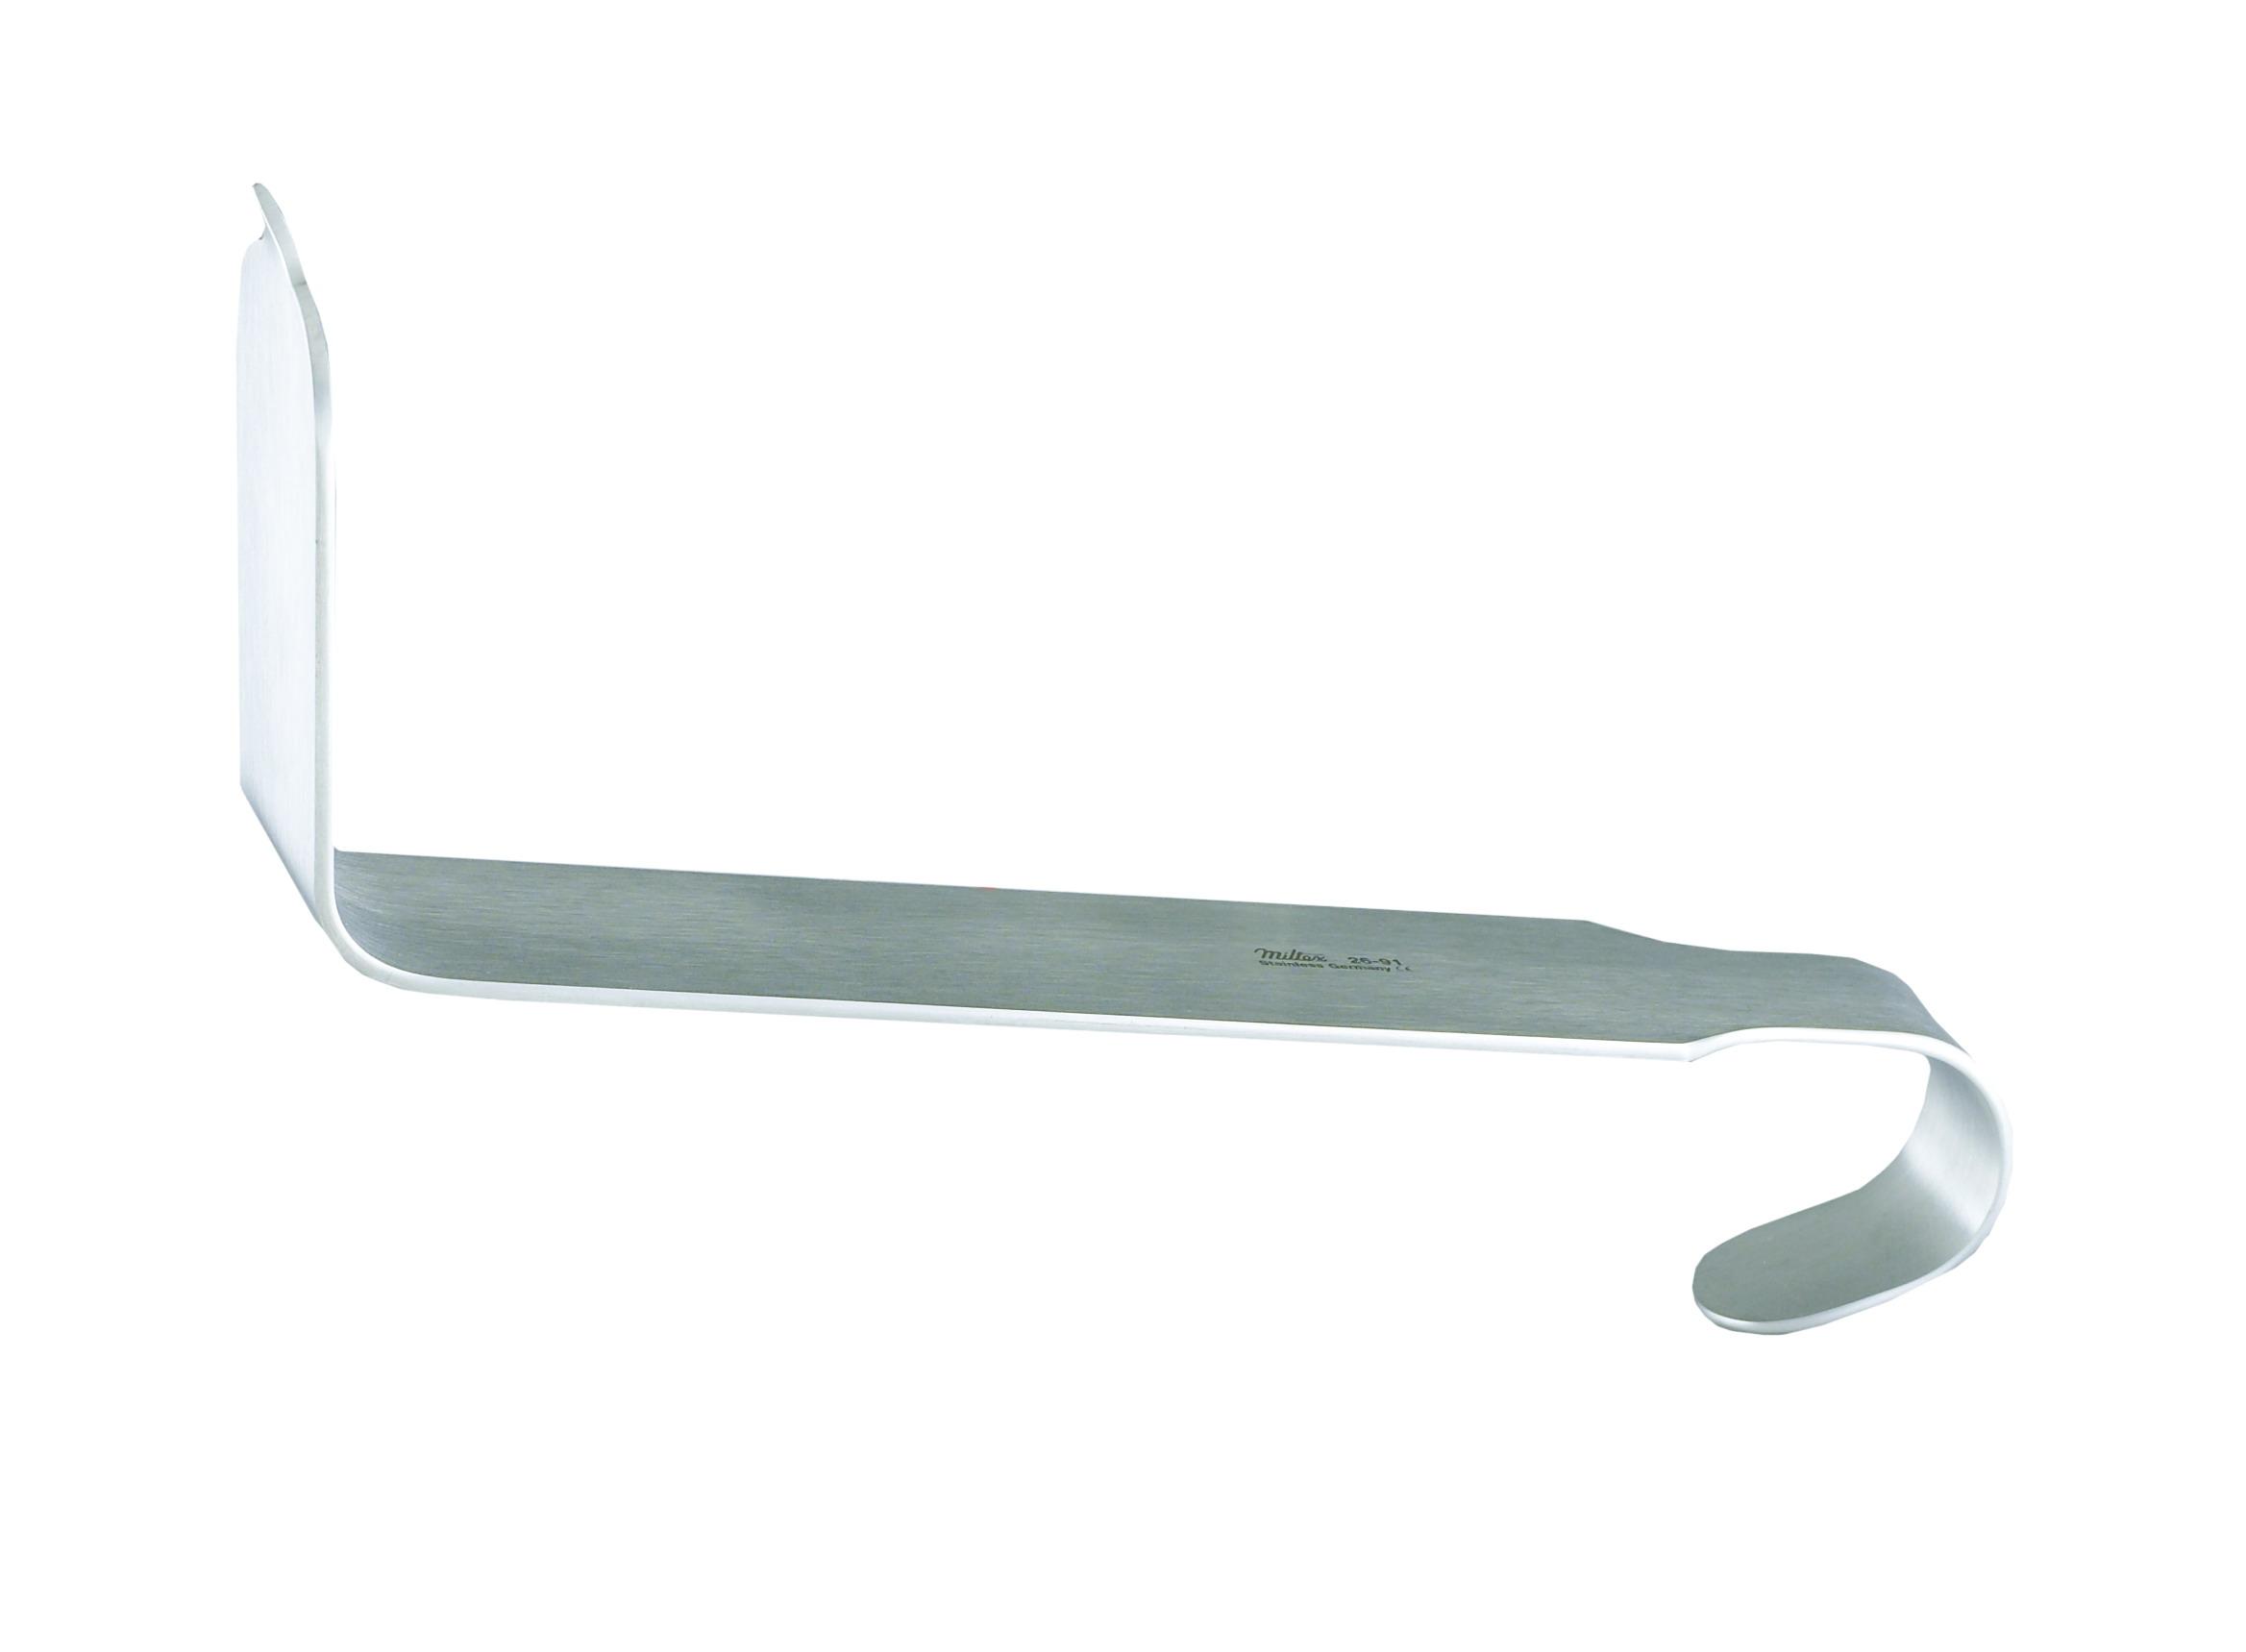 taylor-spinal-retractor-7-1-4-184-cm-blade-1-1-4-32-cm-x-3-76-cm-26-91-miltex.jpg